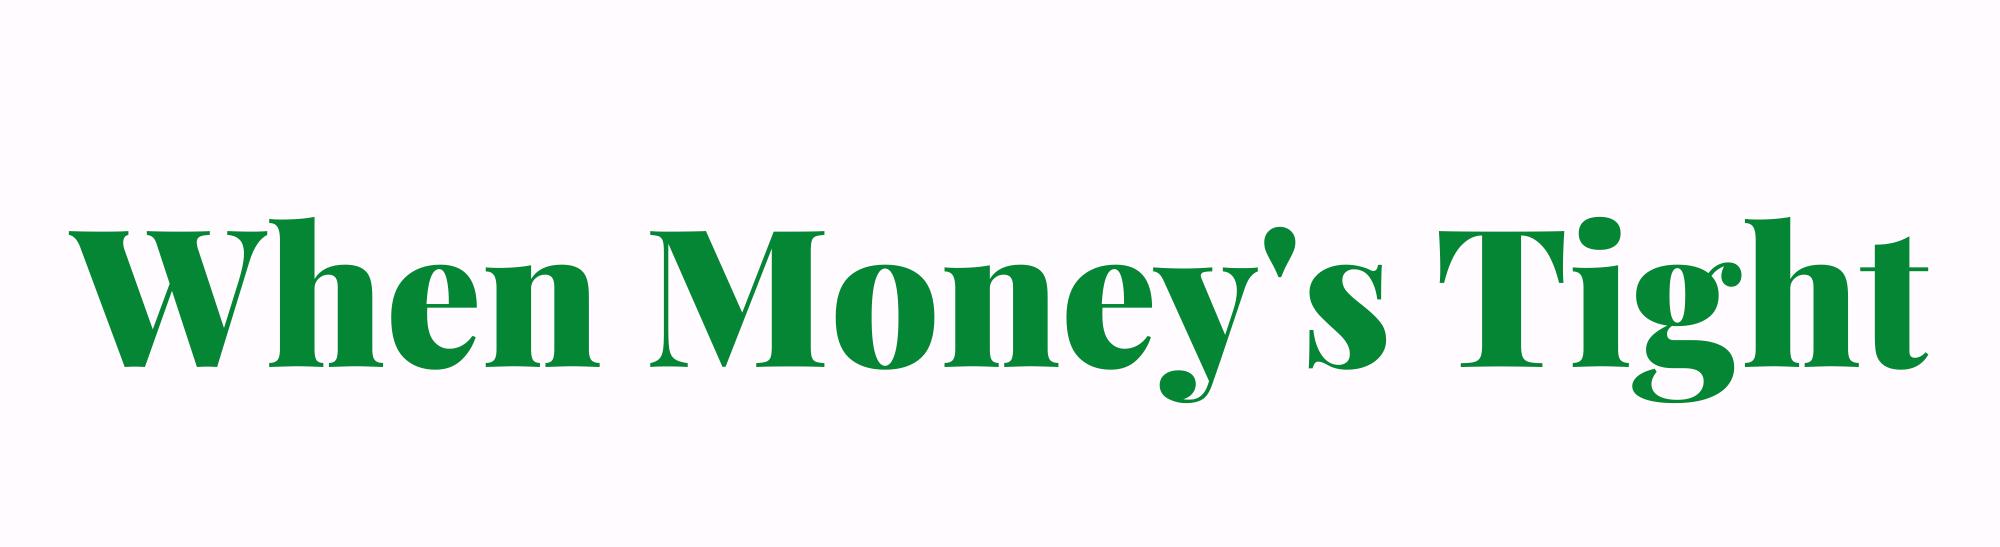 When Money's Tight